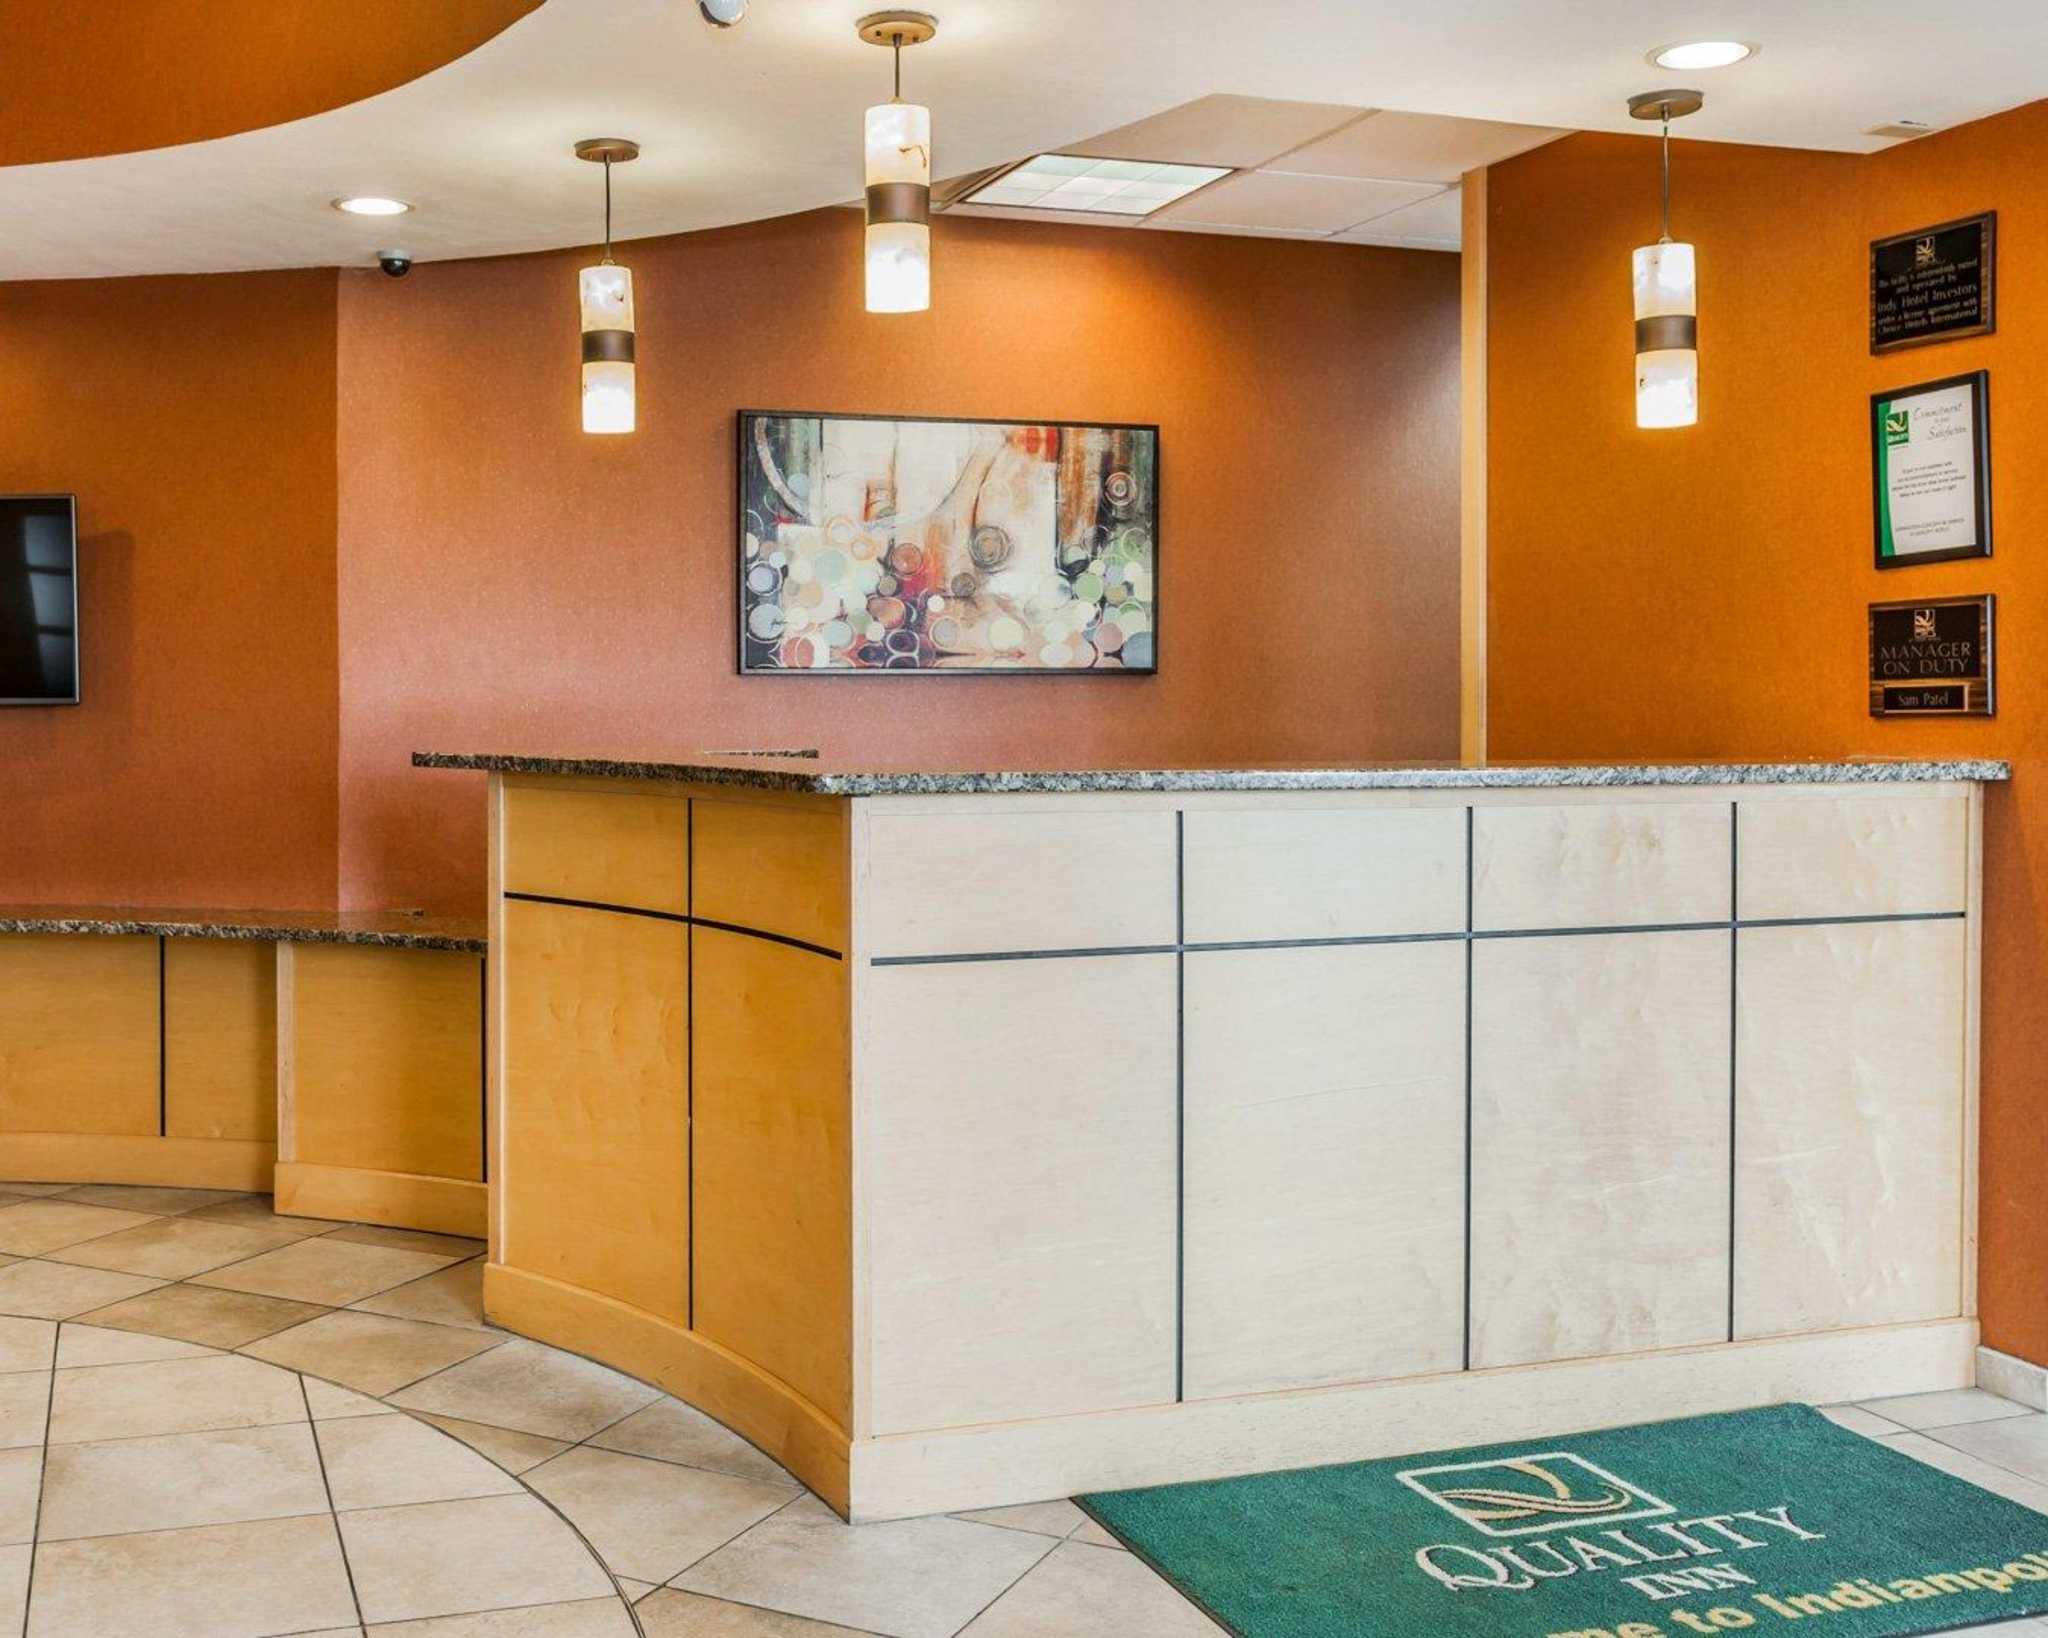 Quality Inn East image 15